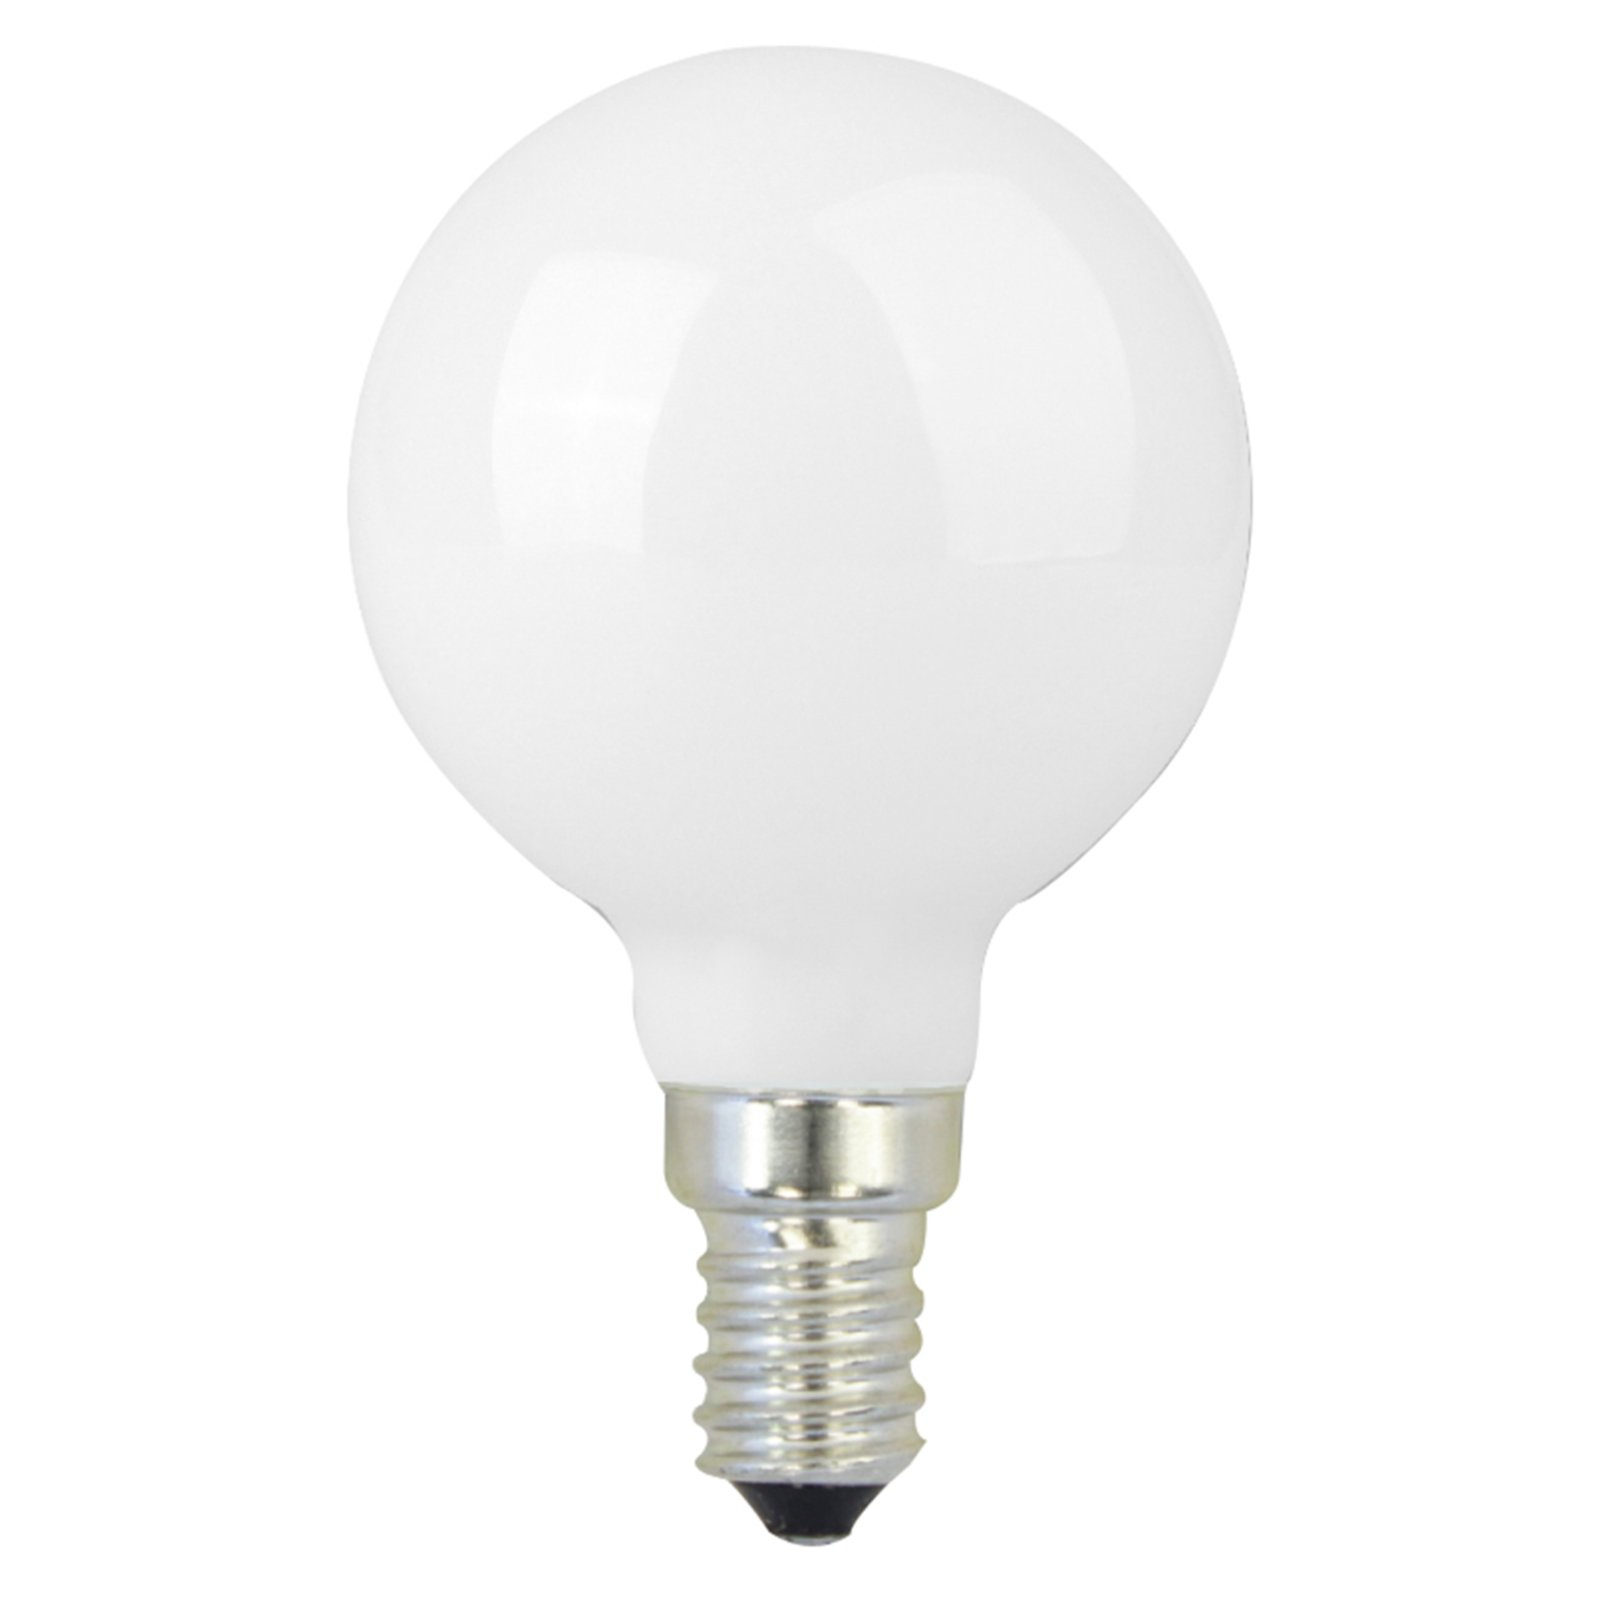 led leuchtmittel tropfen lightme e14 1 8 watt warmwei led leuchtmittel lampen. Black Bedroom Furniture Sets. Home Design Ideas